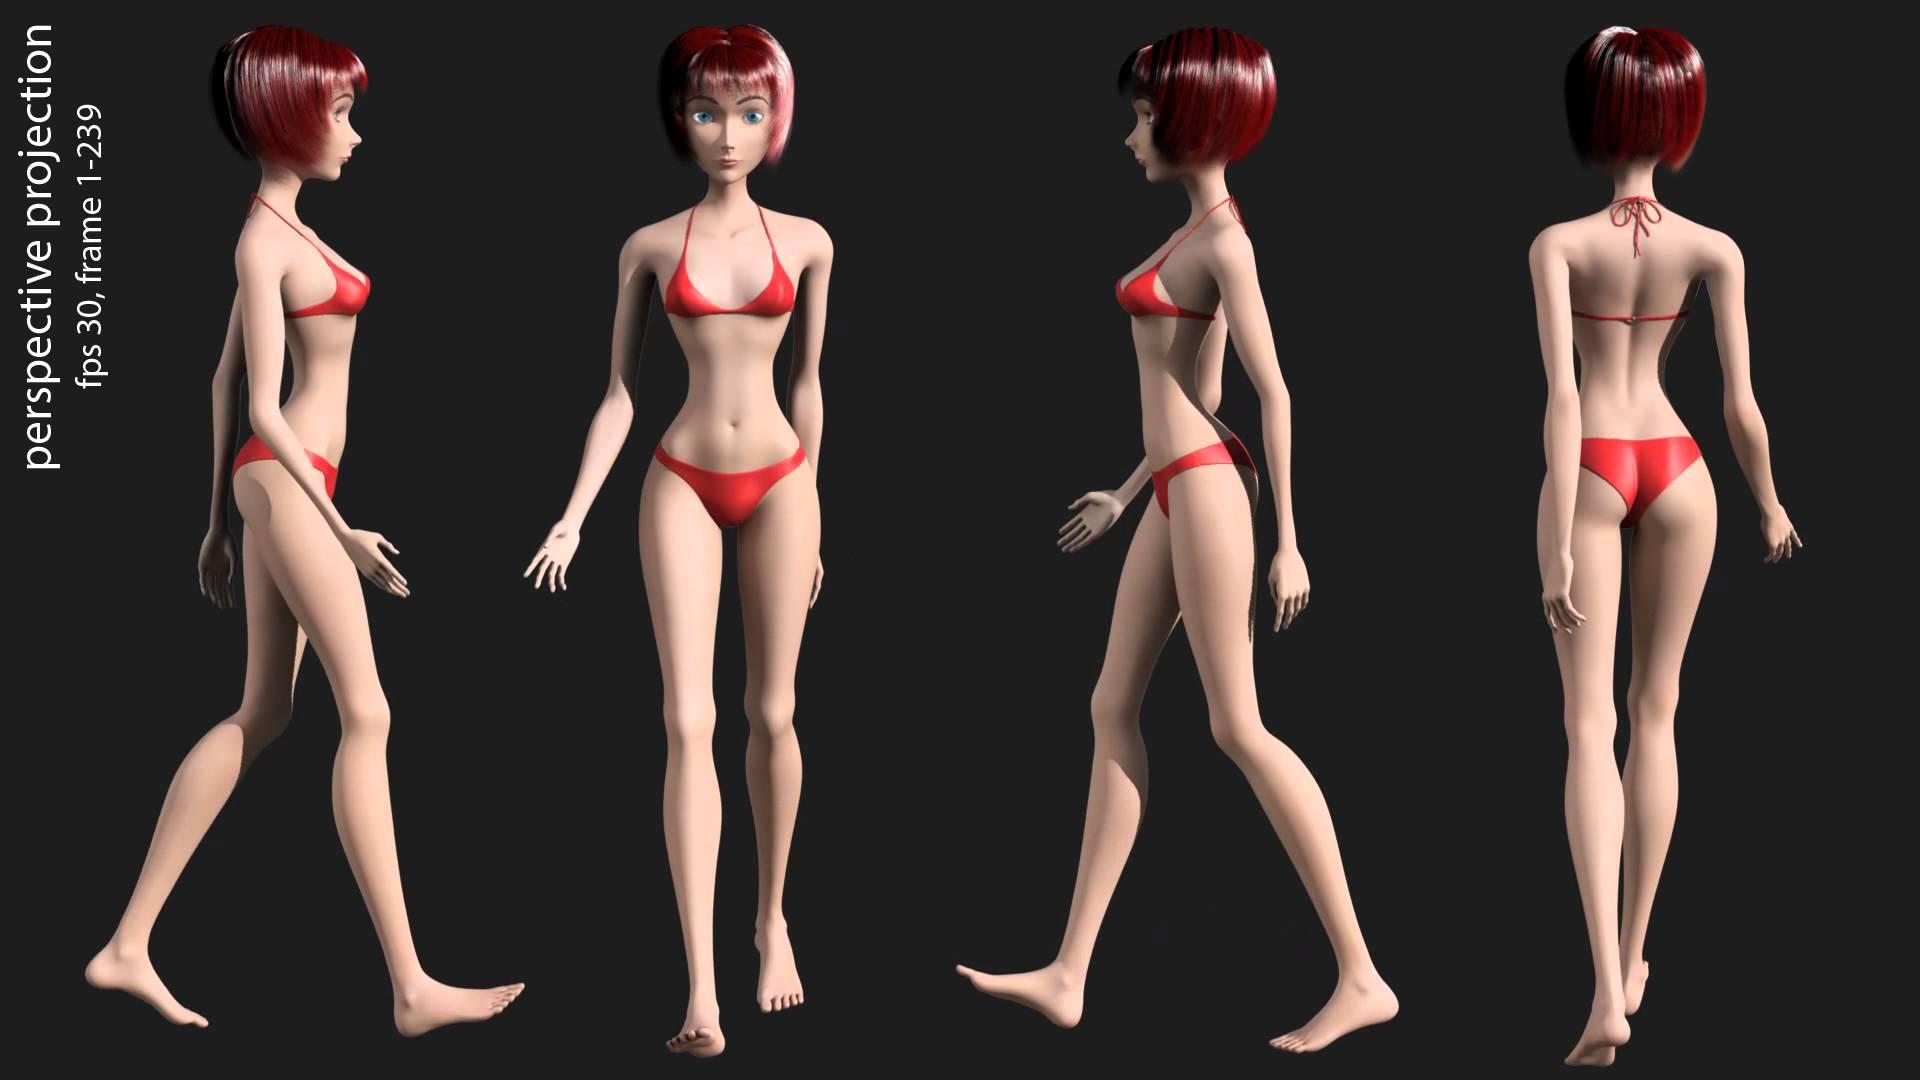 Woman 3d rendering photo